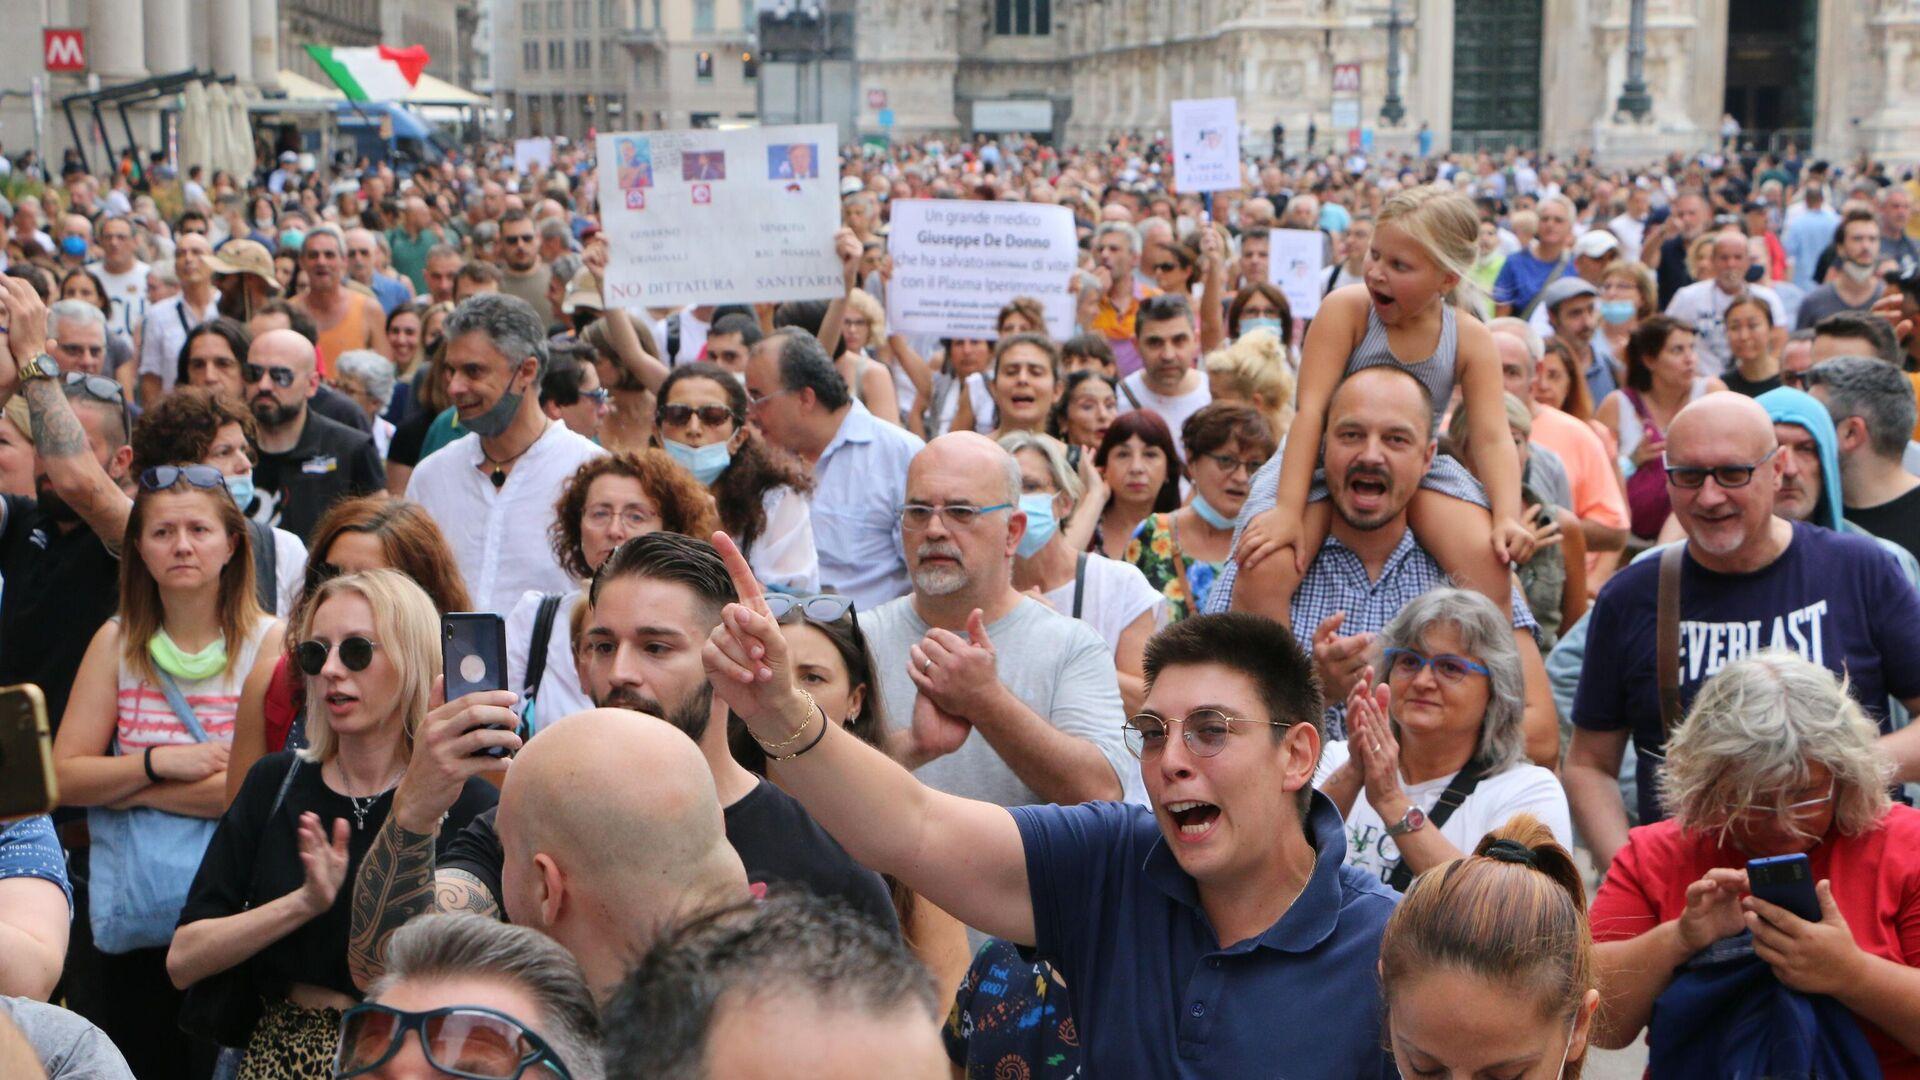 Manifestazione No Green Pass, Milano 31.07 - Sputnik Italia, 1920, 03.08.2021